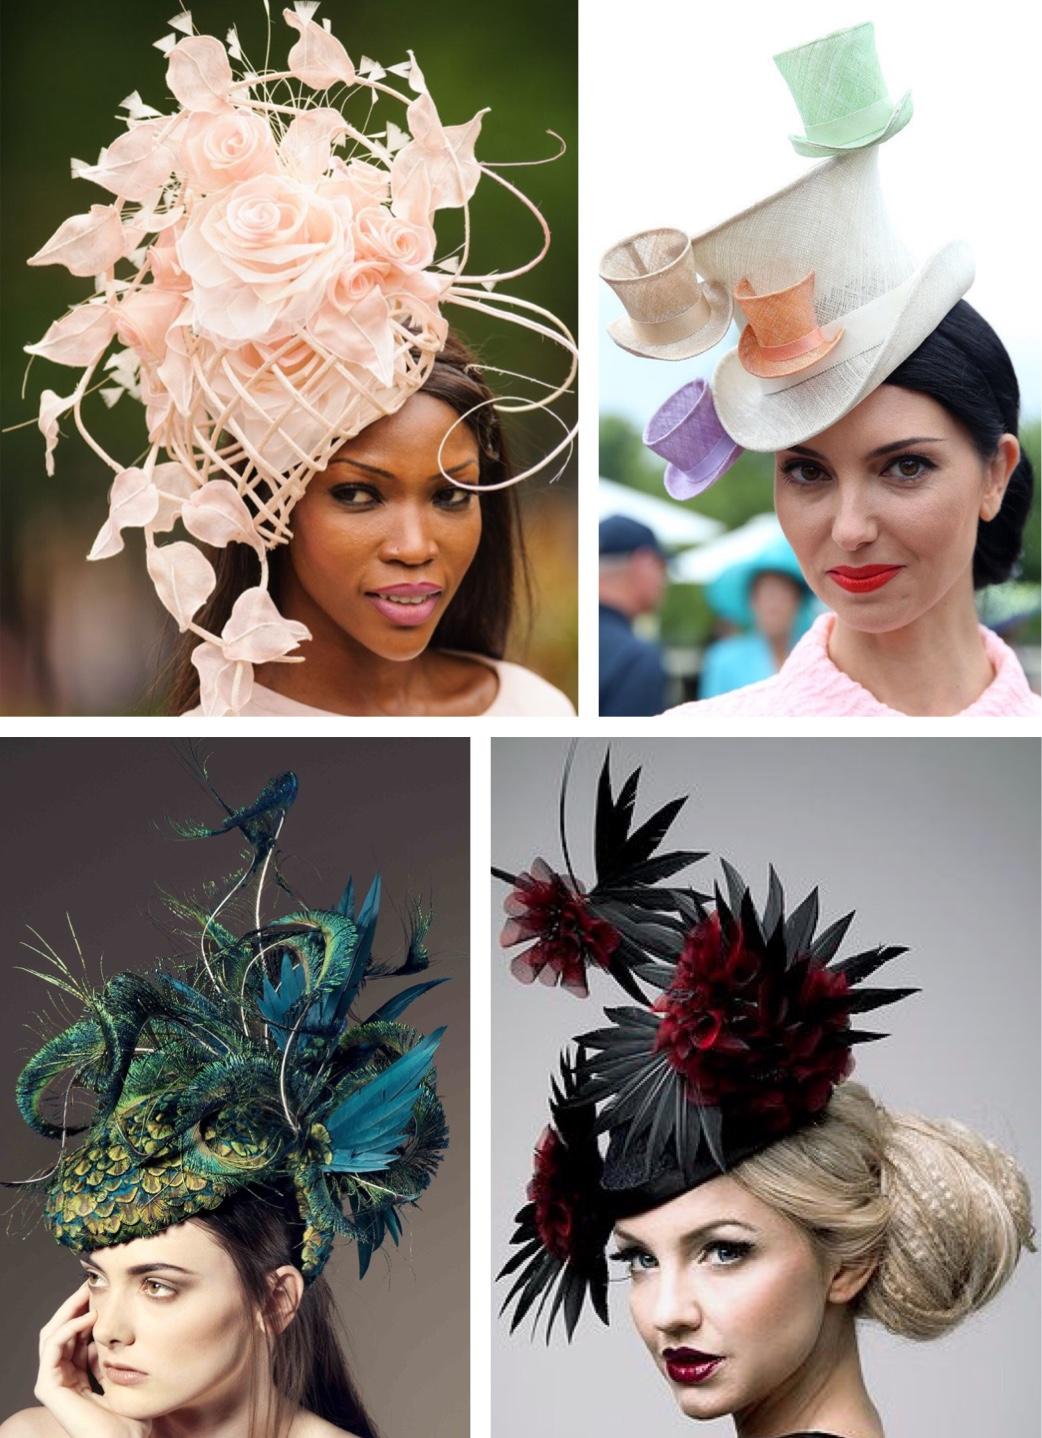 Women wearing elaborate fascinators at horse races